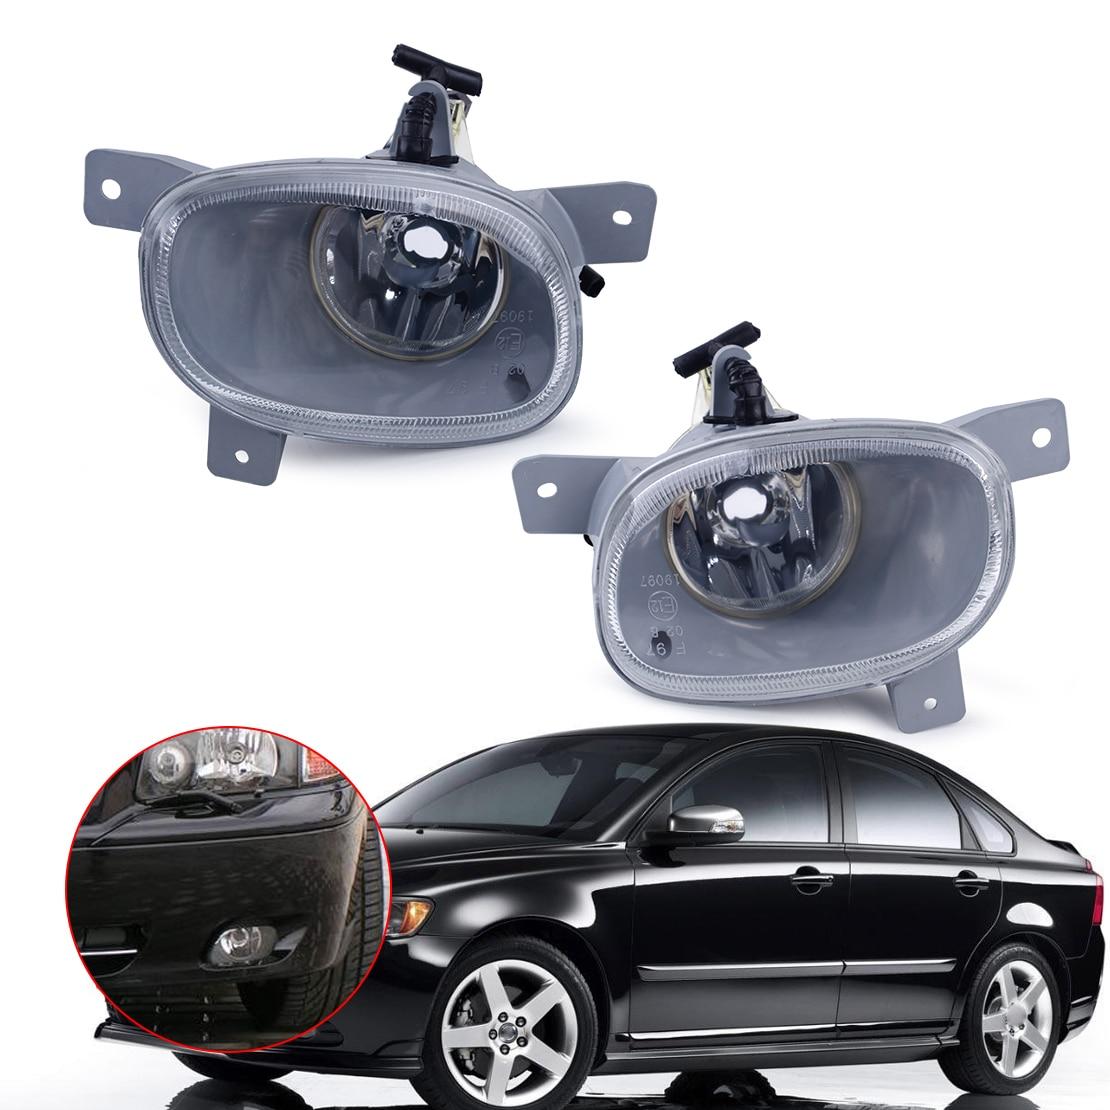 CITALL 1Pc Left Right Front Bumper Fog Light Lamp Fit For Volvo S80 1999 2000 2001 2002 2003 2004 2005 2006 8620224 8620225